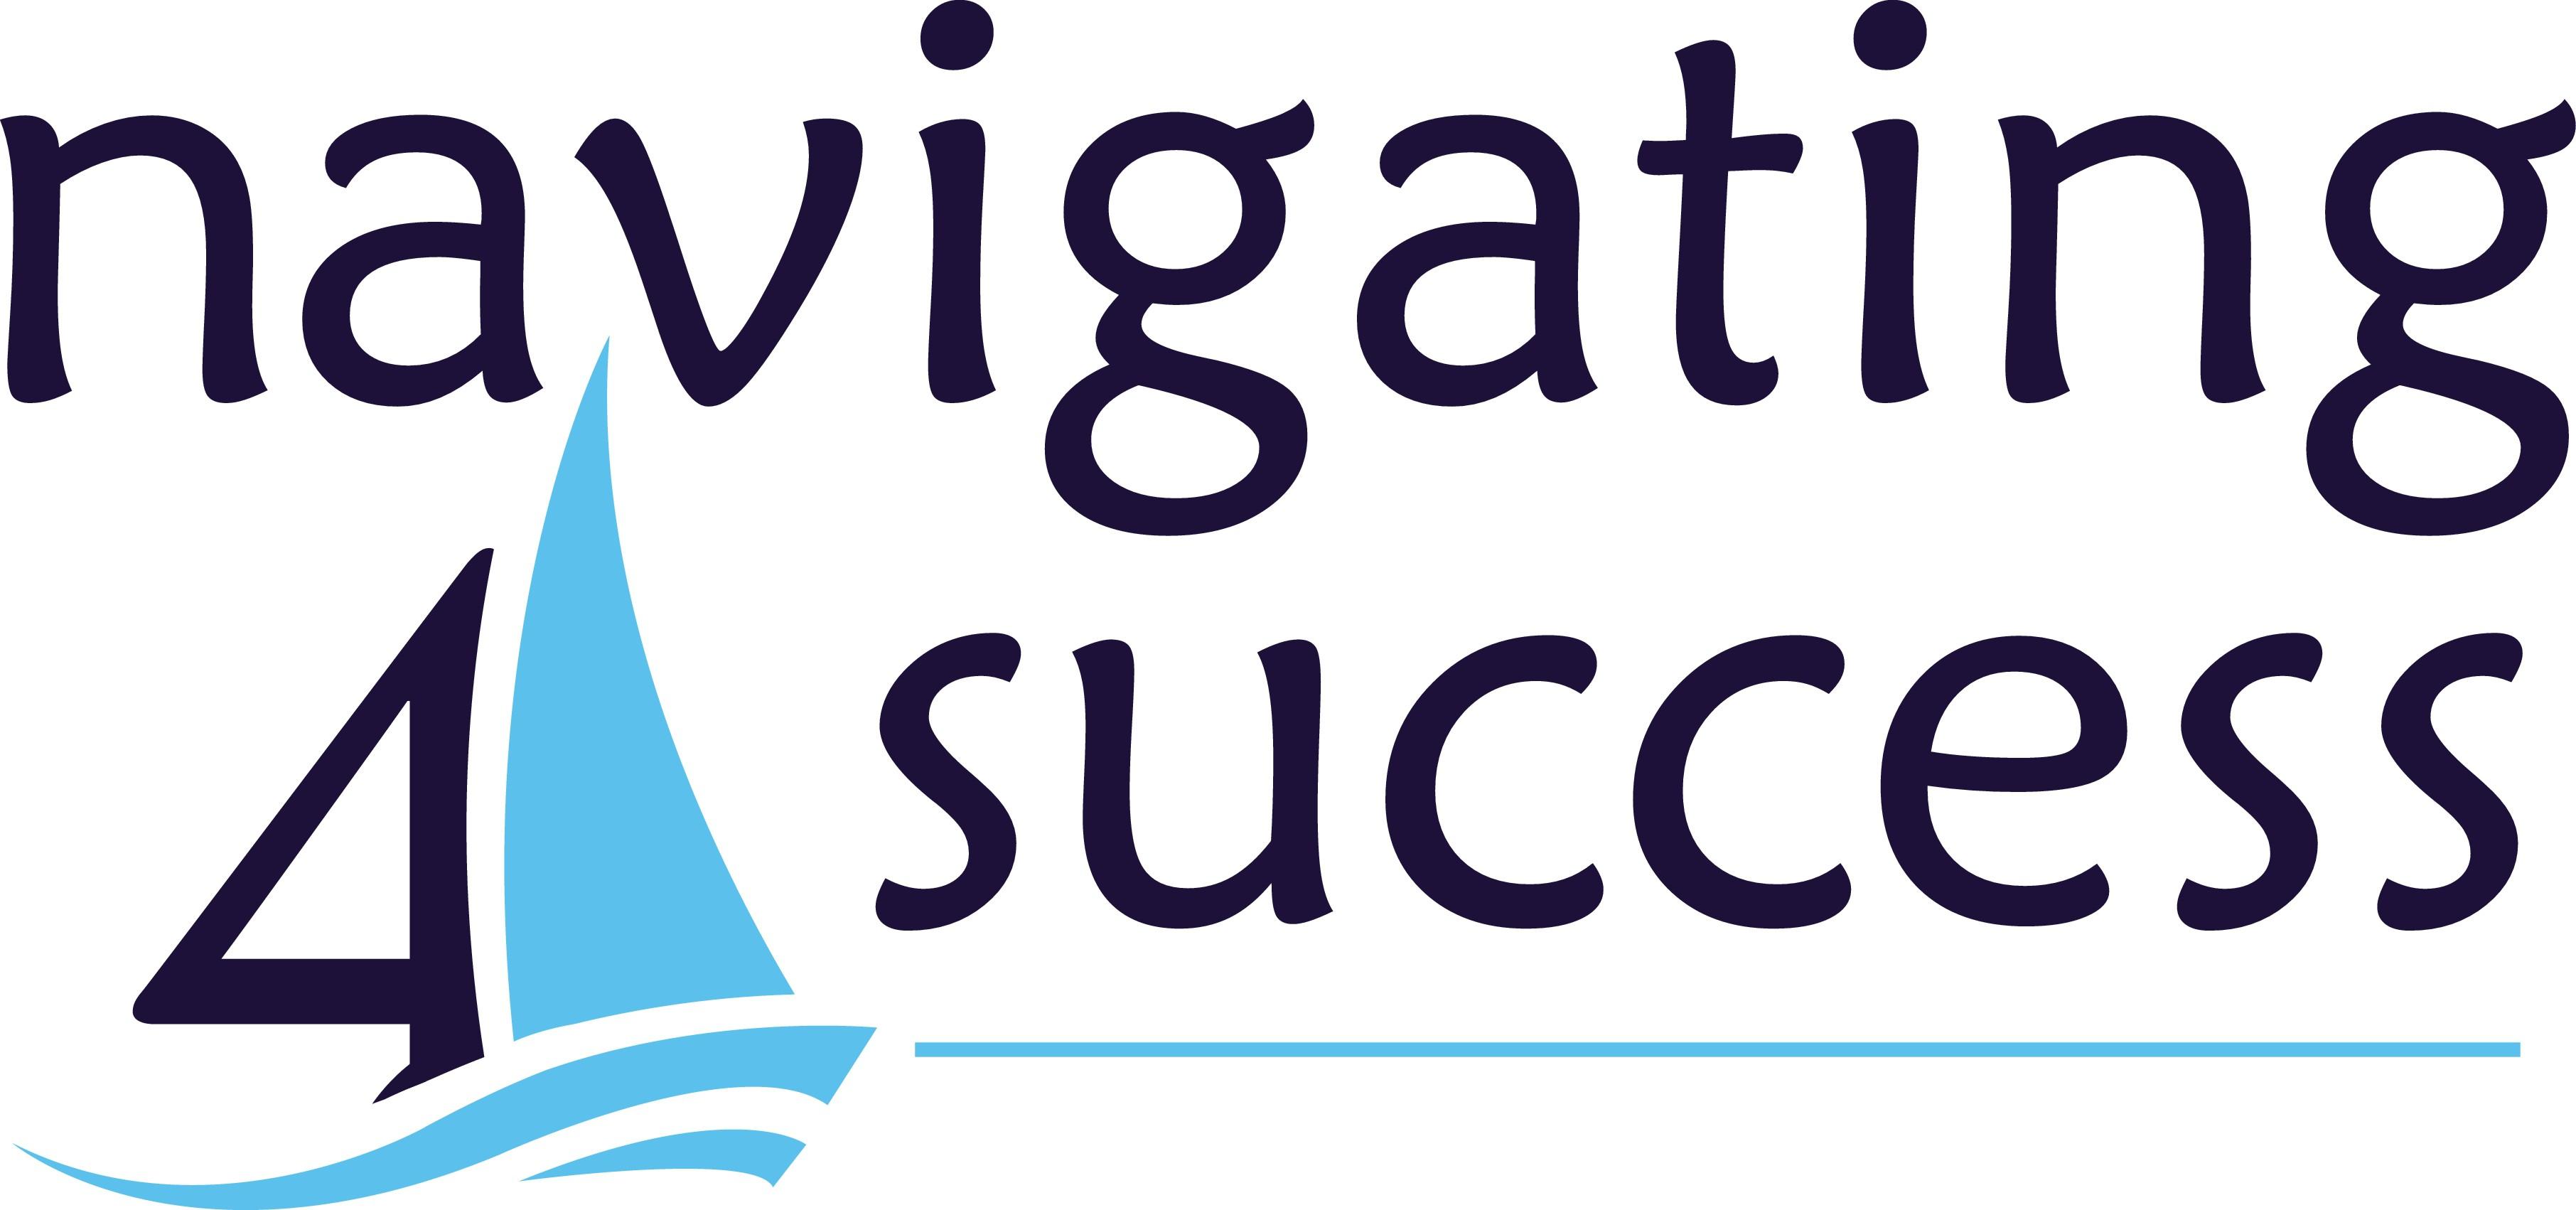 Set sail on a captivating logo for a new leadership blog, Navigating4Success